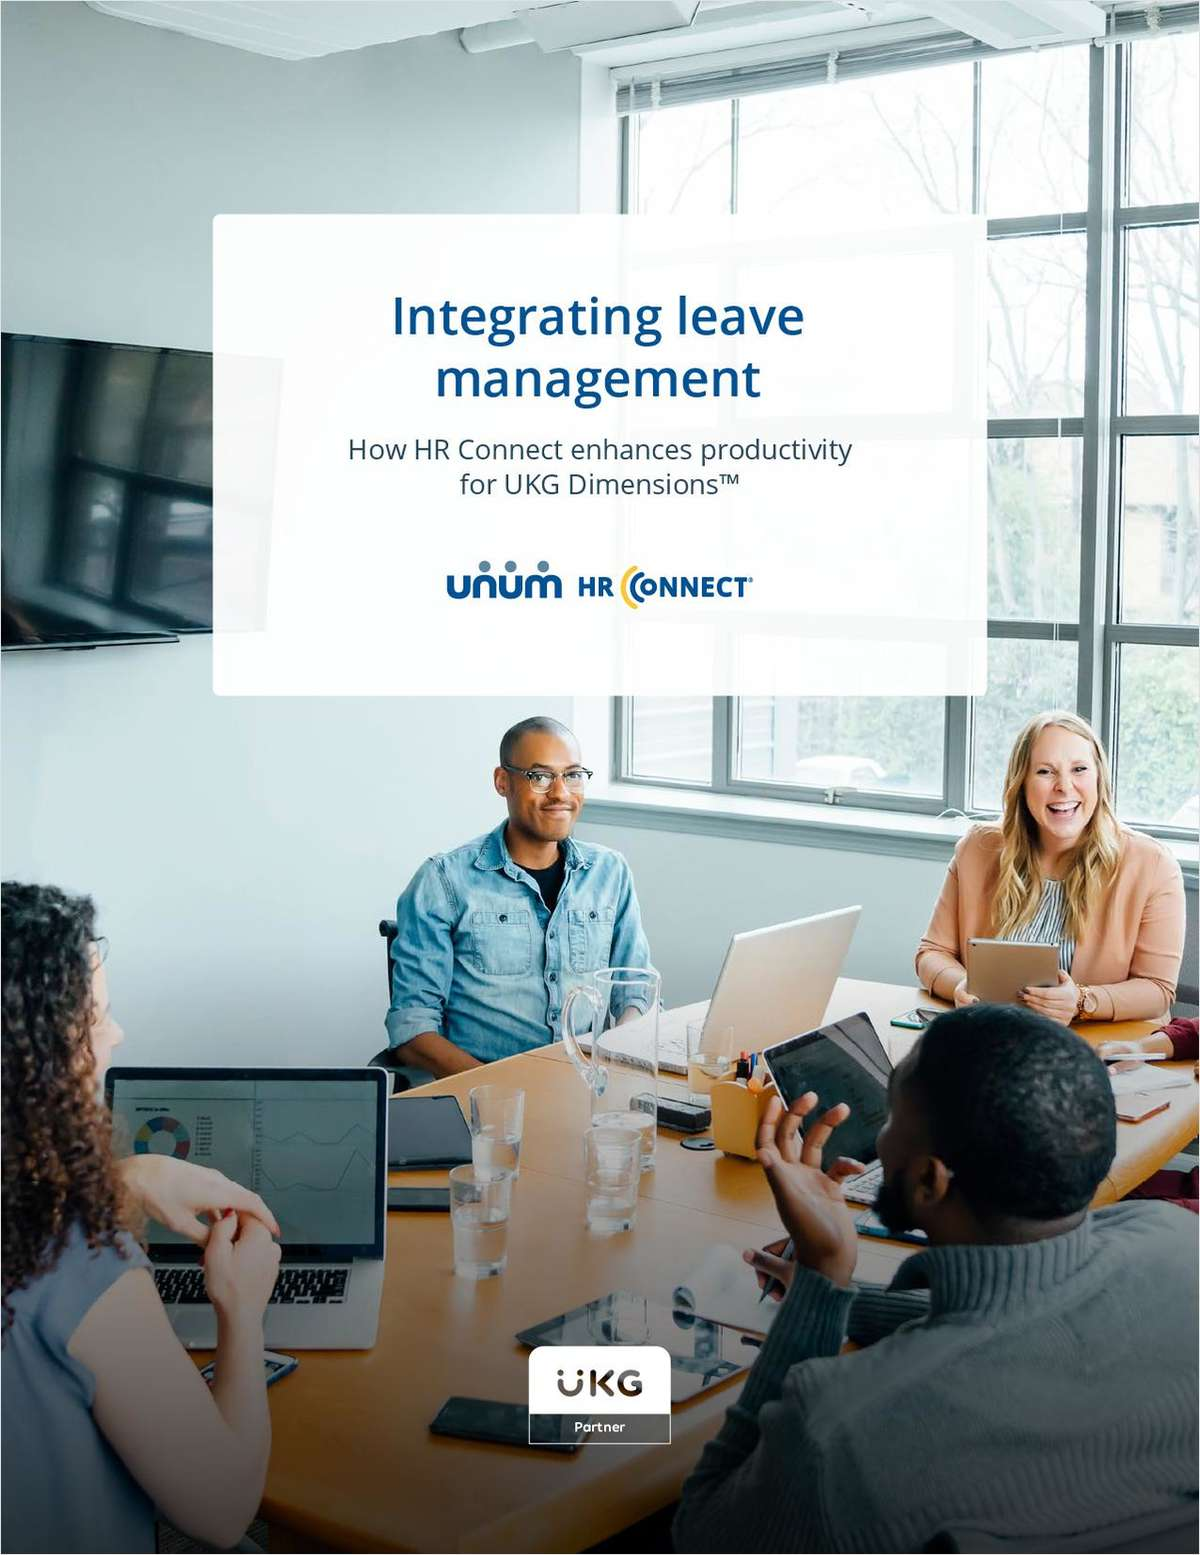 Integrating Leave Management: How HR Connect Enhances Productivity for UKG Dimensions